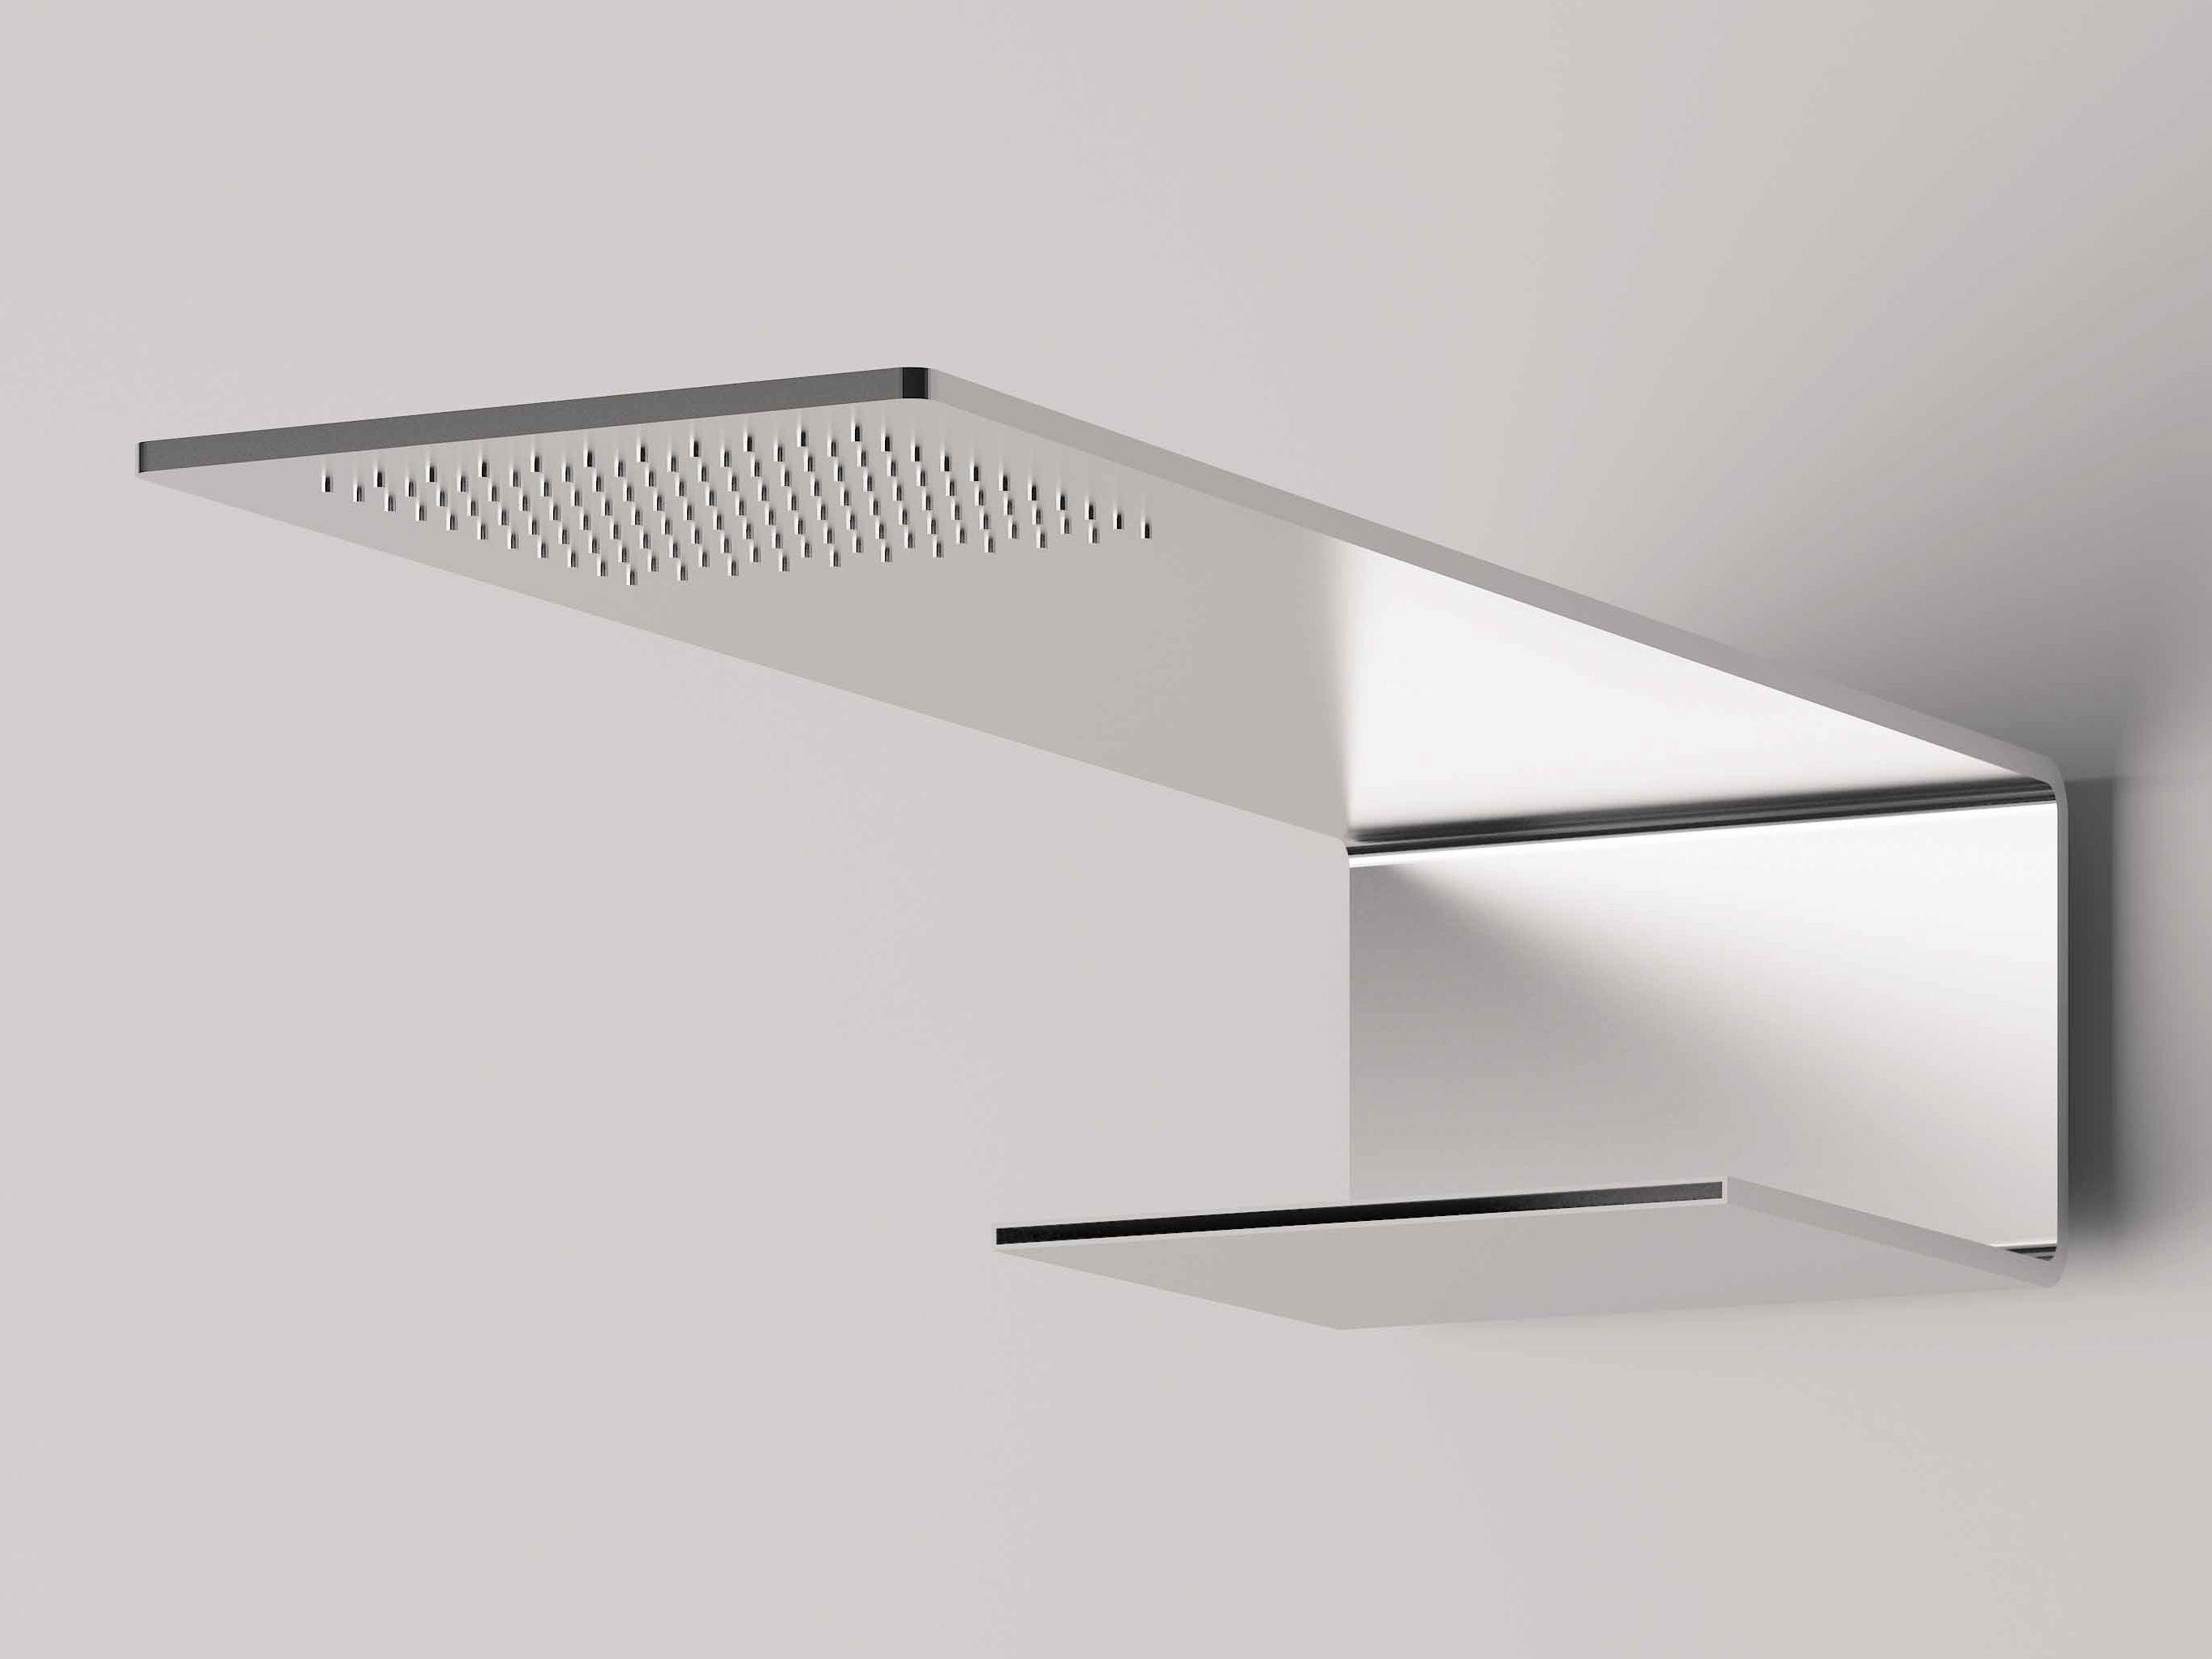 5mm soffione a muro by rubinetterie 3m design oco studio - Soffione a cascata ...